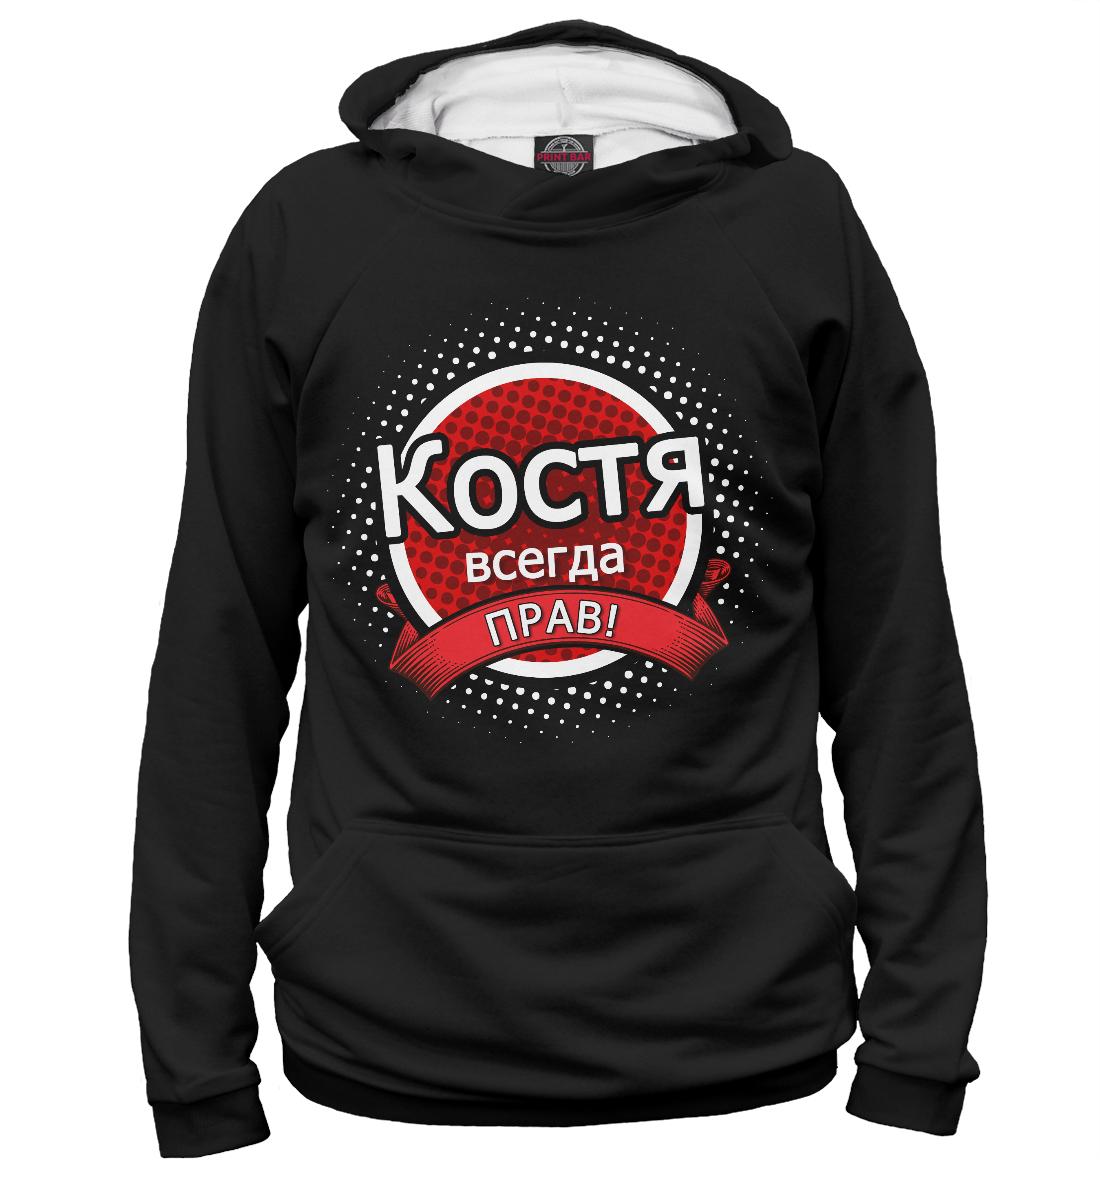 Купить Костя, Printbar, Худи, KST-589765-hud-1